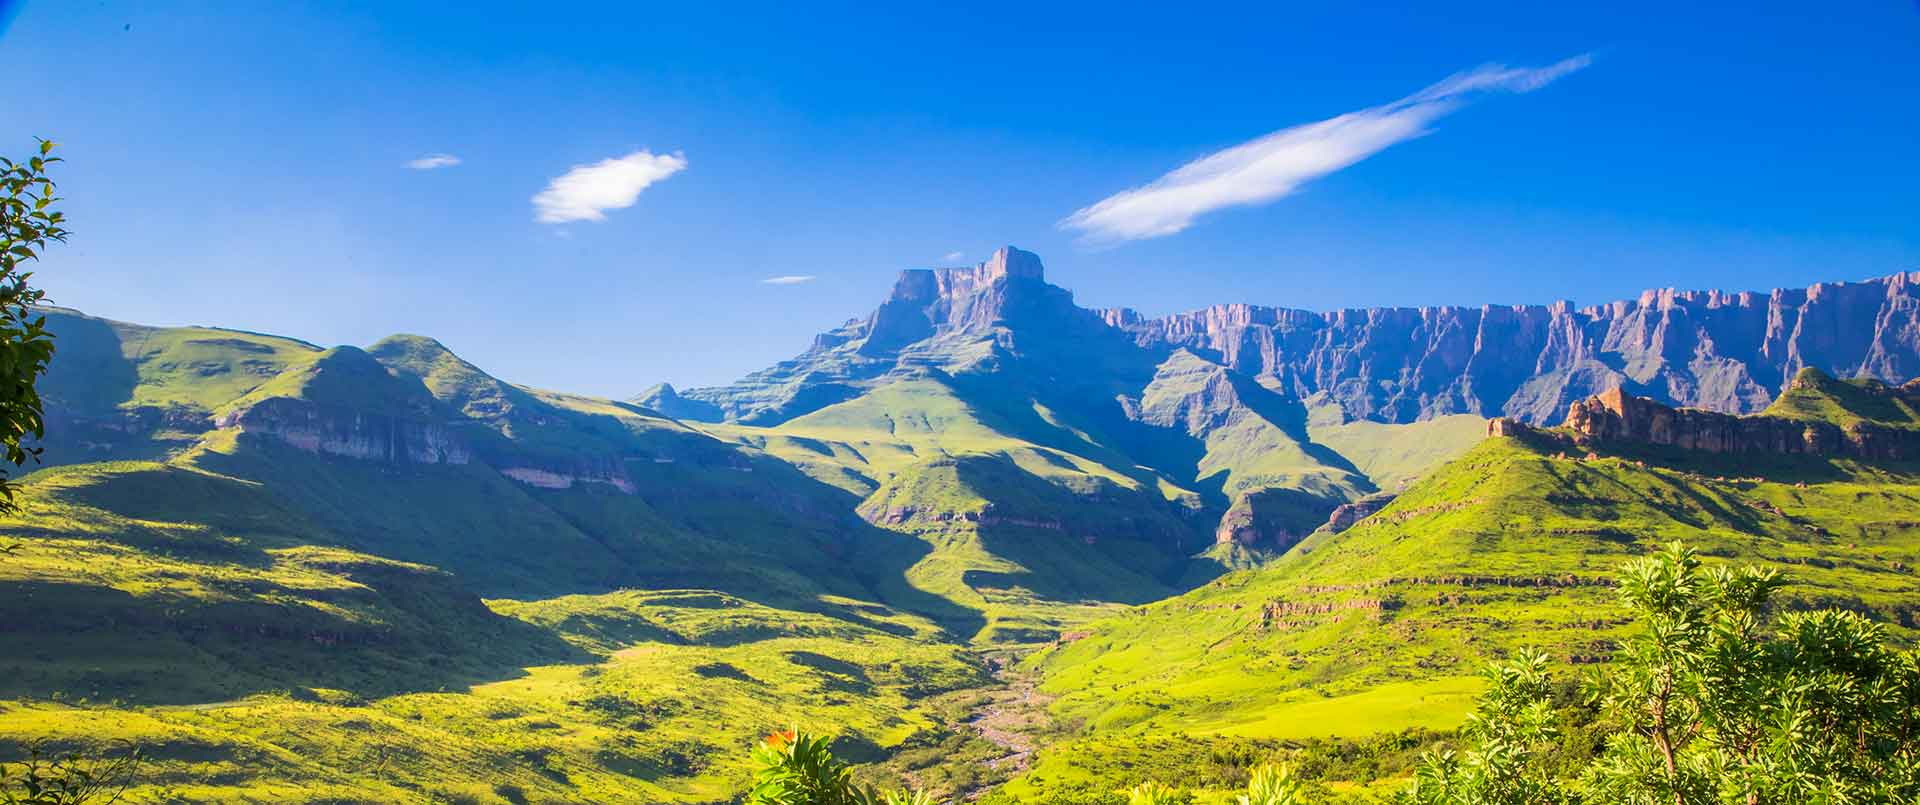 Spectacular KwaZulu-Natal